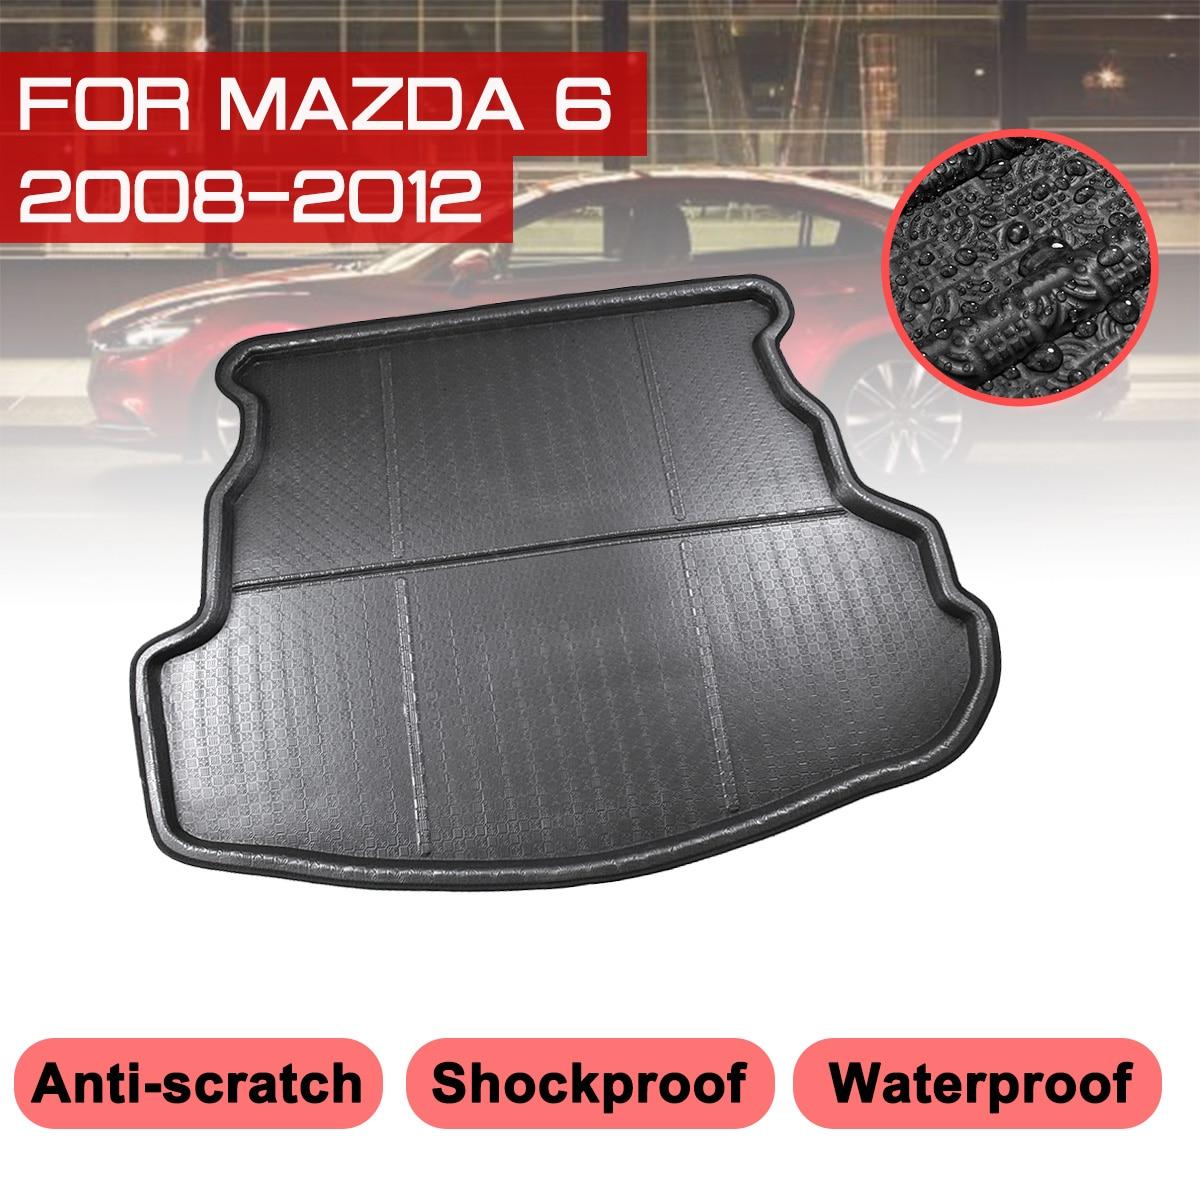 Car Rear Trunk Boot Mat For Mazda 6 2008 2009 2010 2011 2012 Waterproof Floor Mats Carpet Anti Mud Tray Cargo Liner   - title=